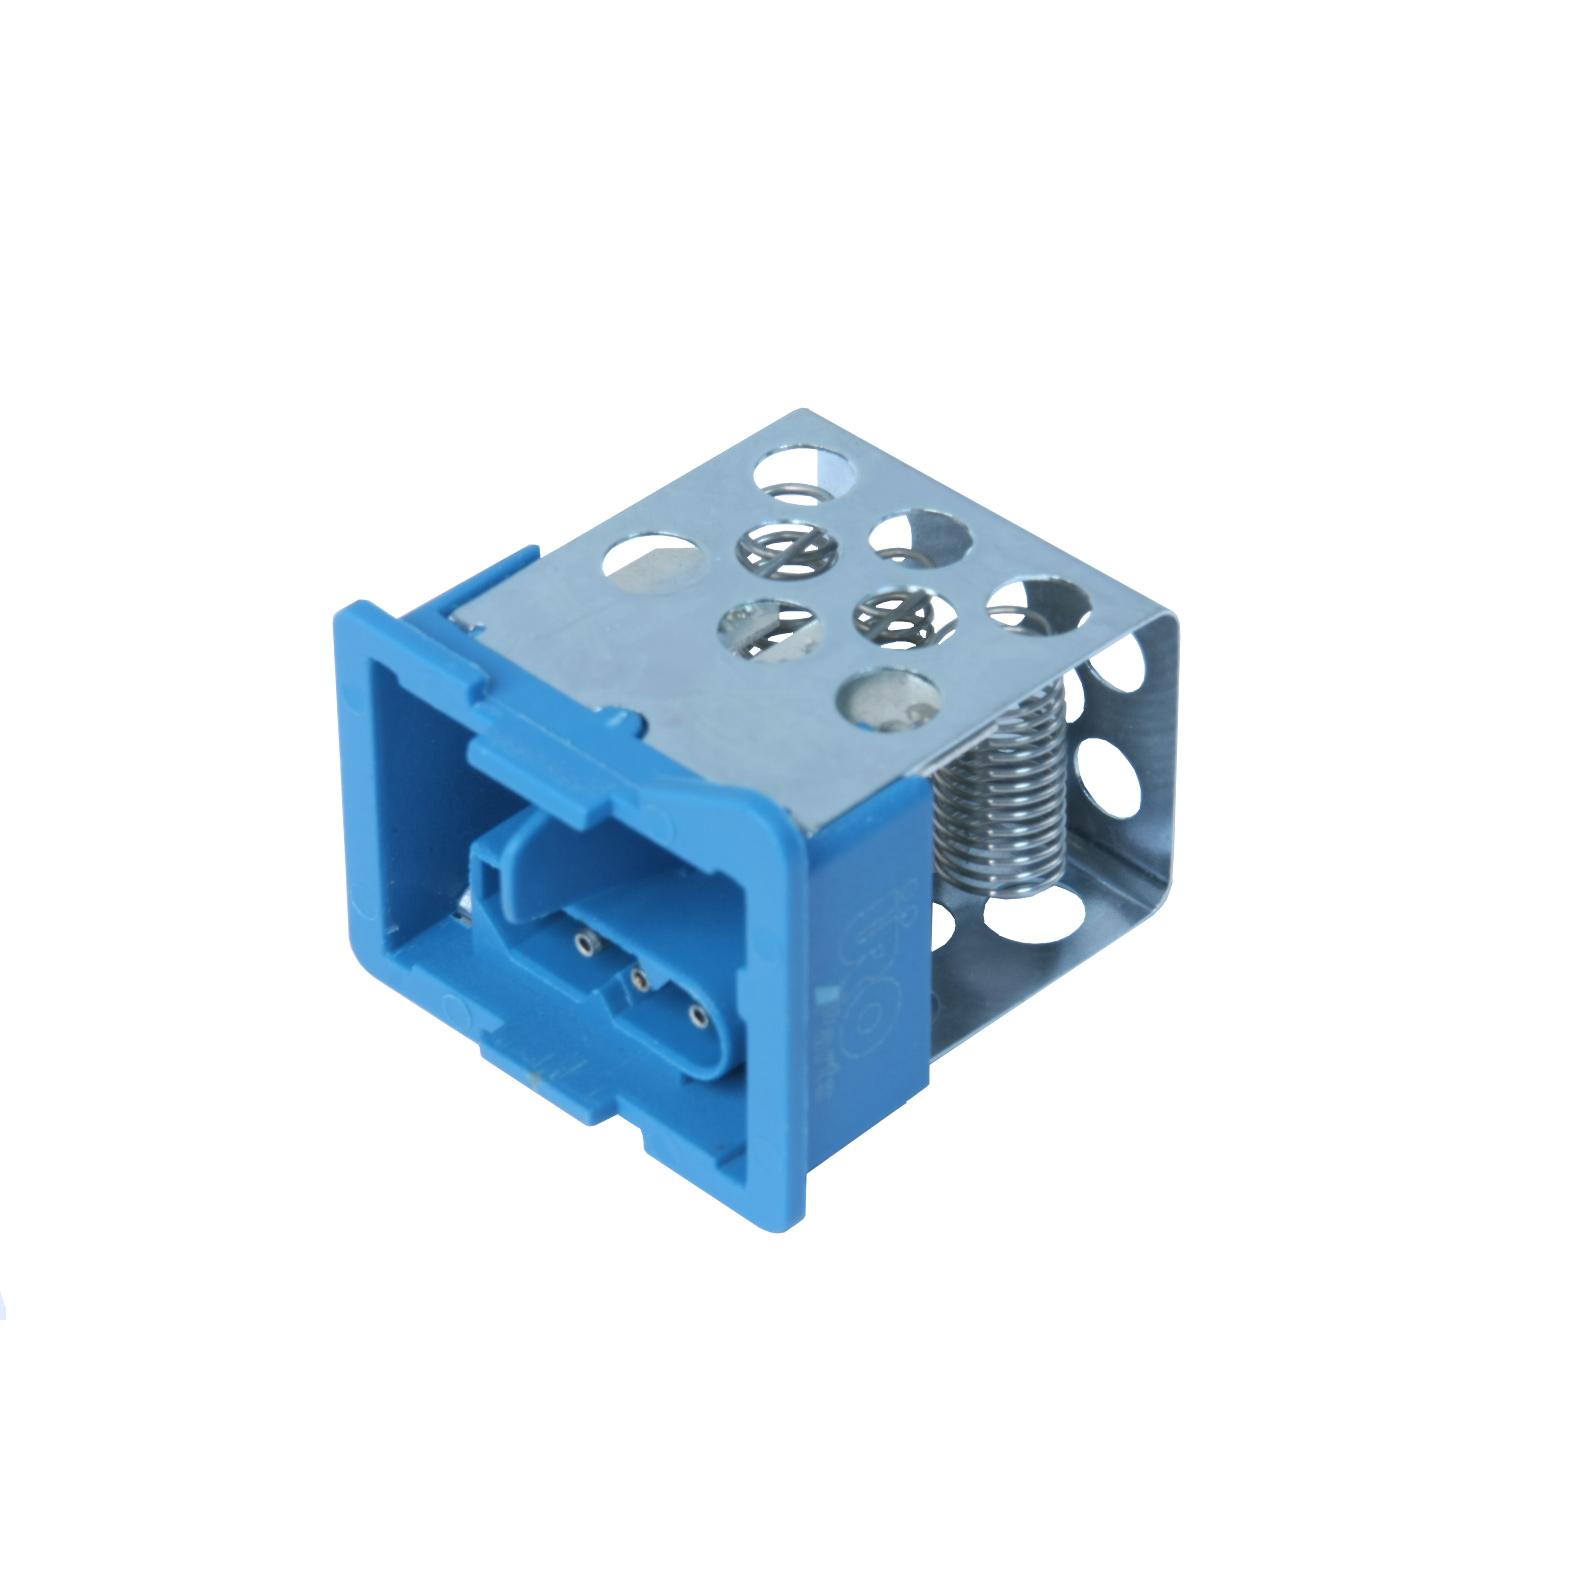 e34 bmw fan switch wiring diagram list of wiring diagrams E53 Wiring Diagram